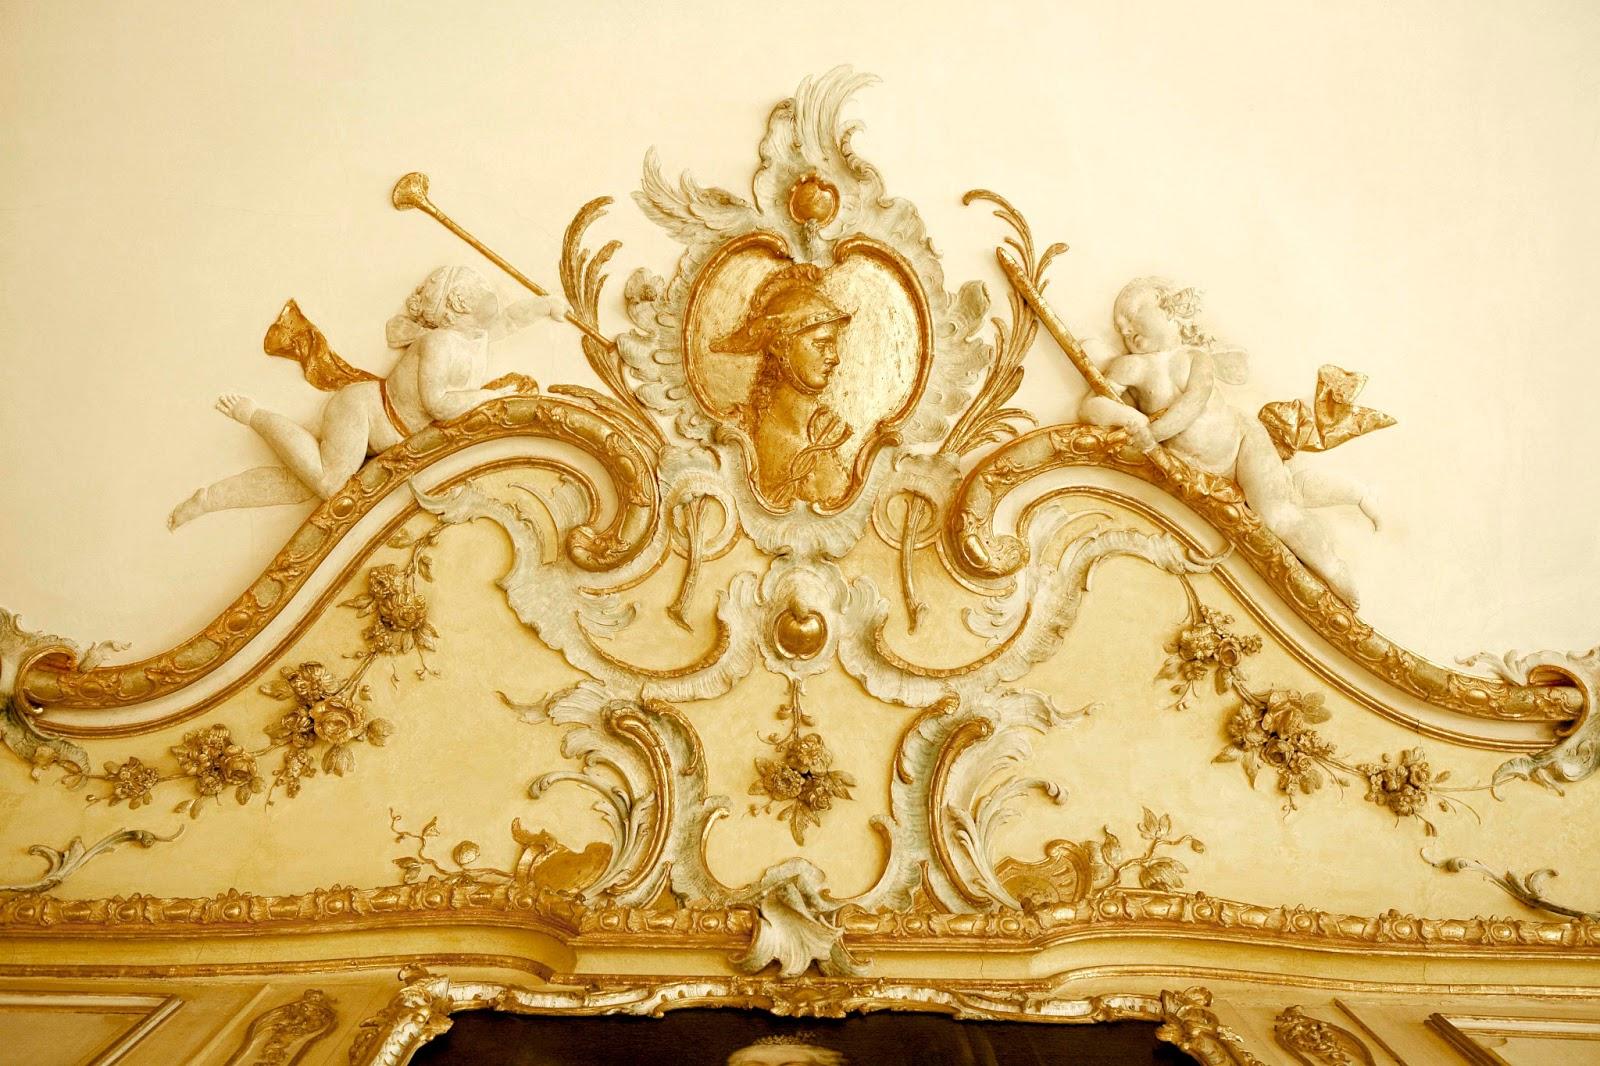 augustusburg castle germany wallpapers - Augustusburg Castle Germany HD Wallpaper Wallpaperrs